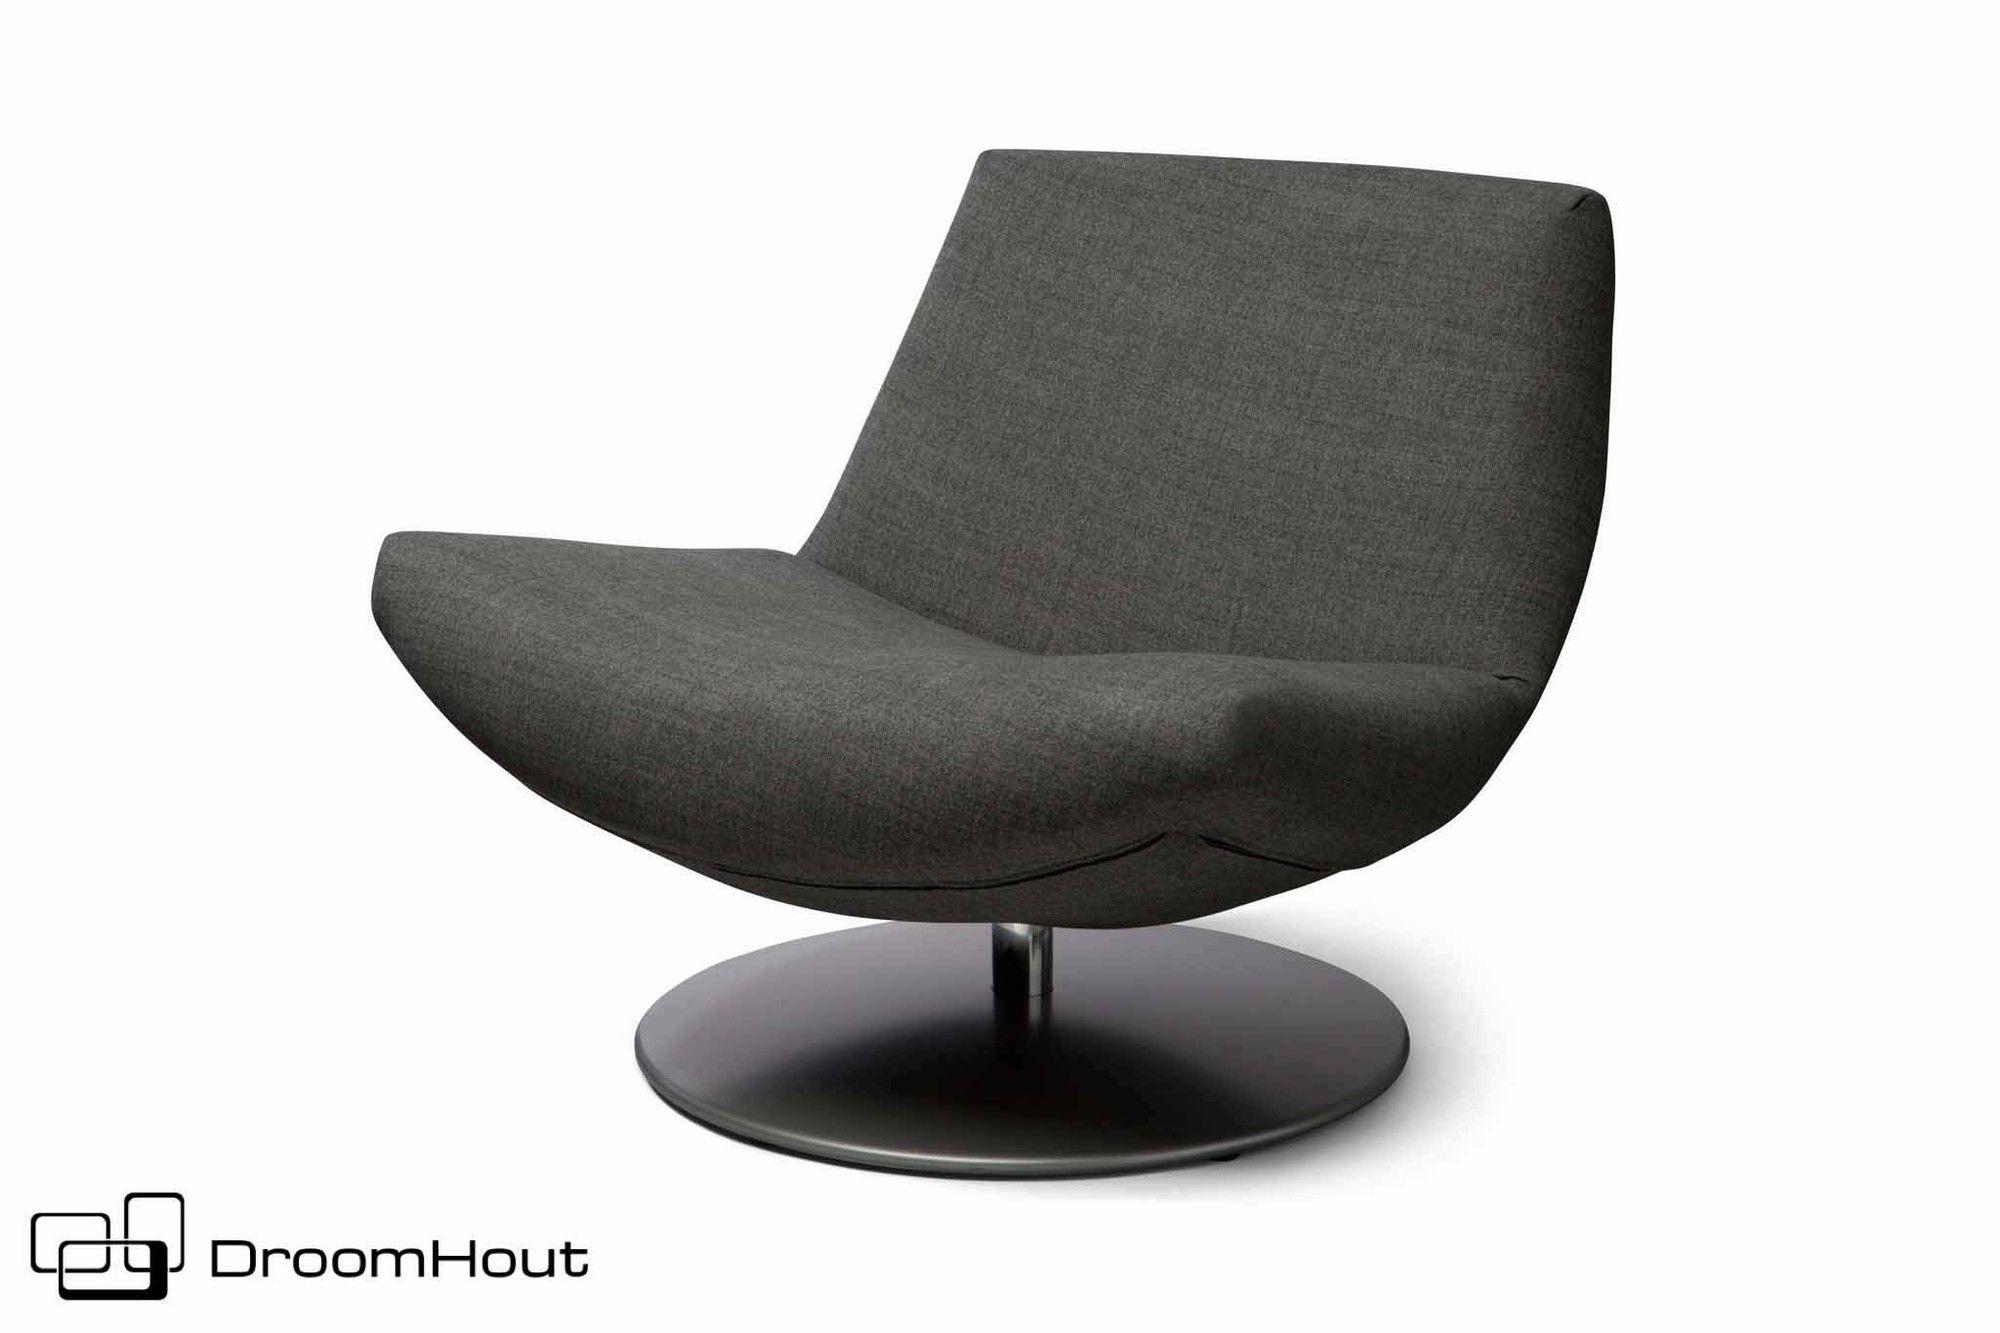 Droomhout |  Dyyk fauteuil Coco Plus